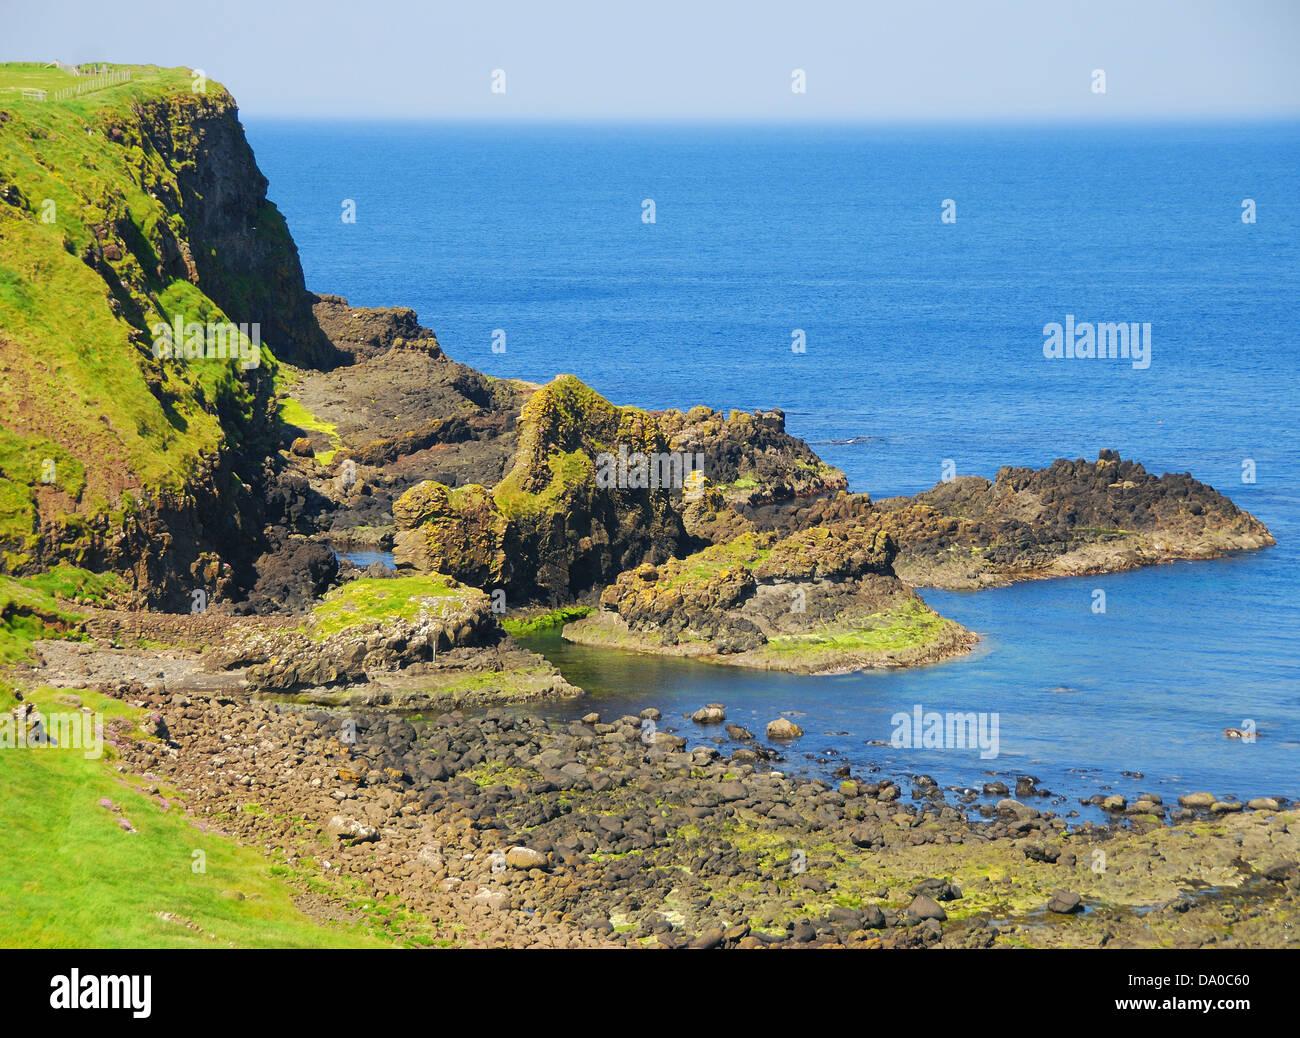 Photograph of the coastline near Giant's Causeway, Northern Ireland. - Stock Image